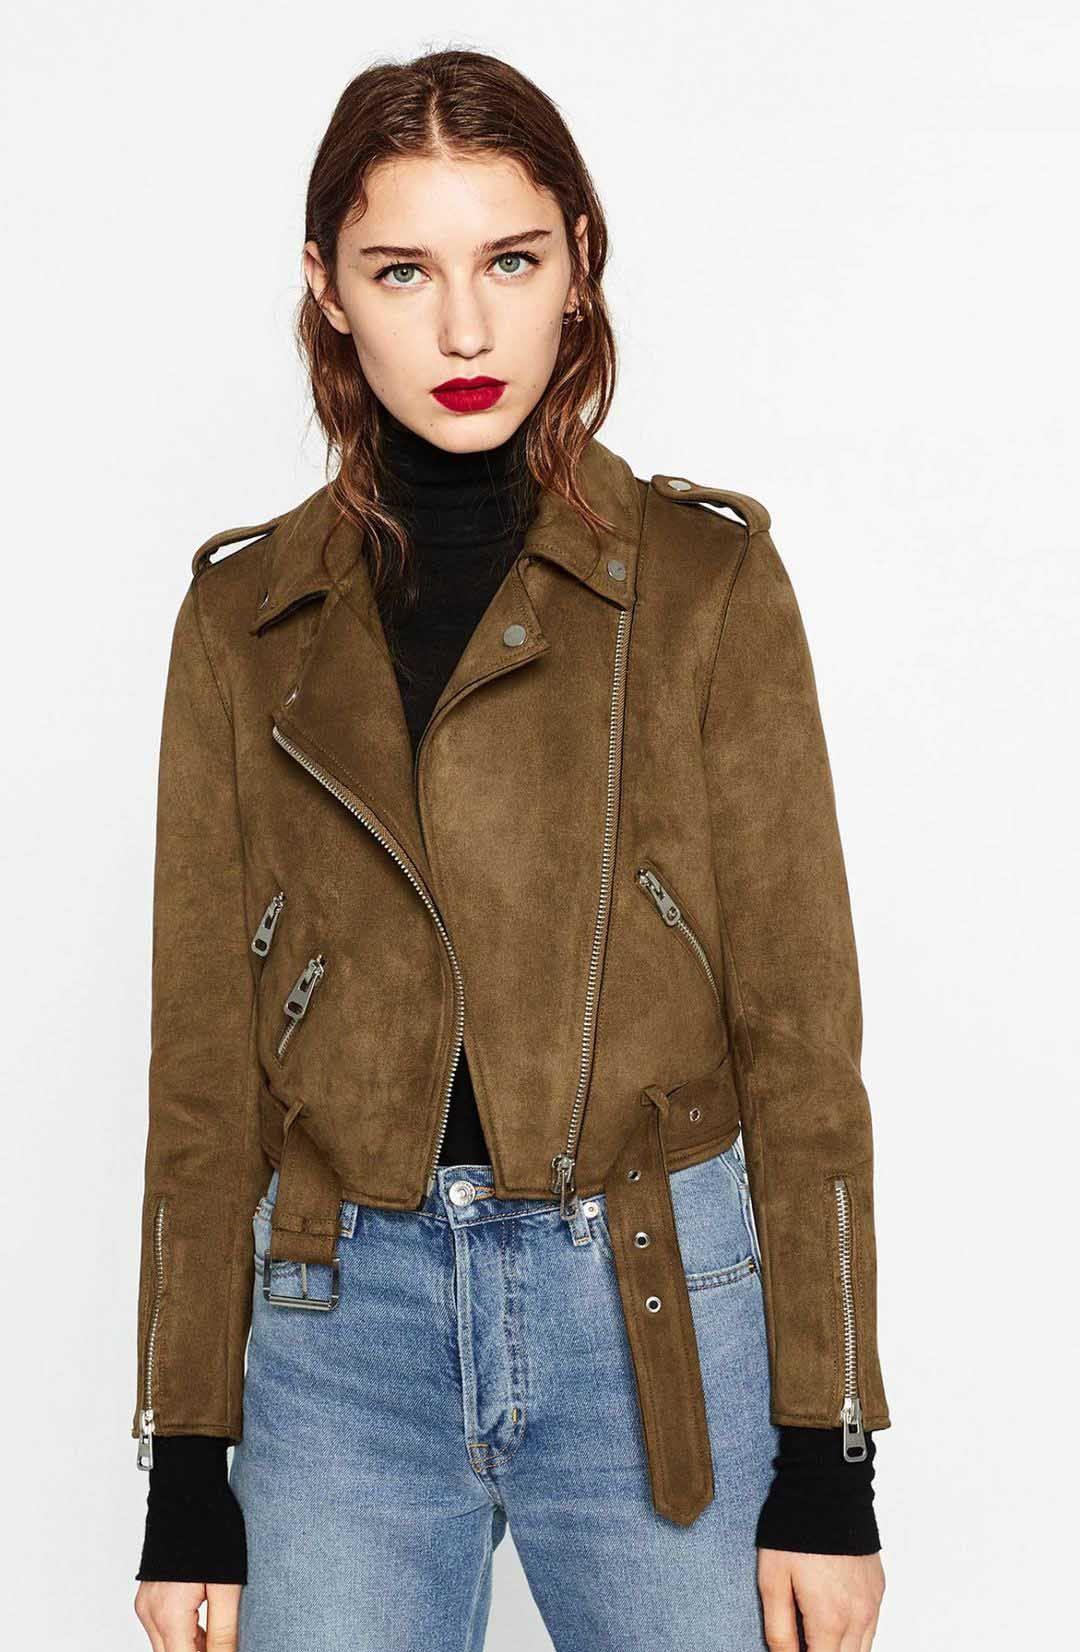 Chaqueta de bombardero de gamuza gruesa de invierno para mujer 2016 Otoño insignia biker chaqueta básica abrigo Moda cálida manga larga ropa corta